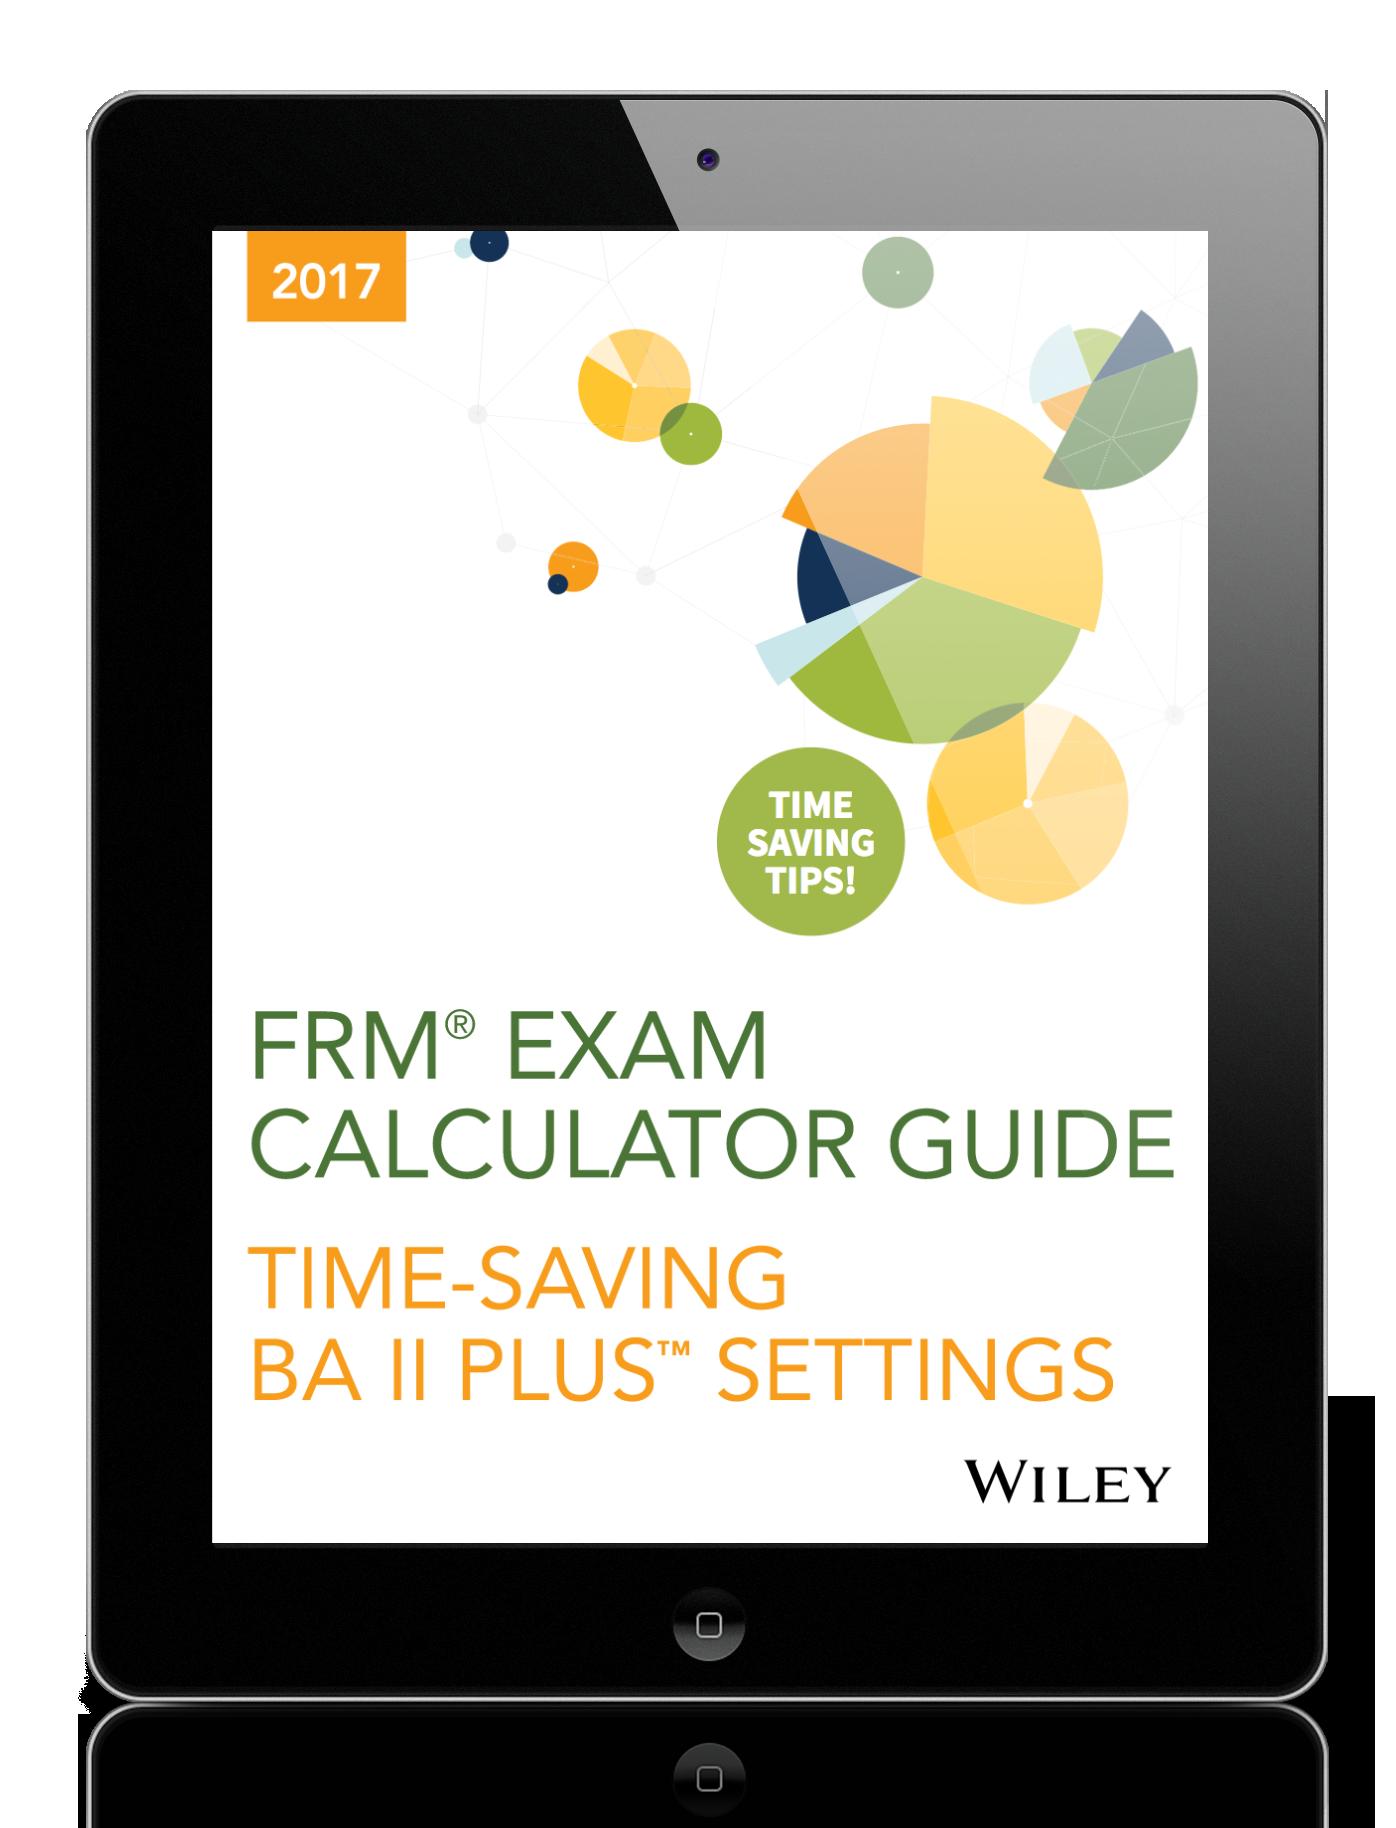 FRM® Exam Calculator Guide: Time-Saving BA II Plus Settings